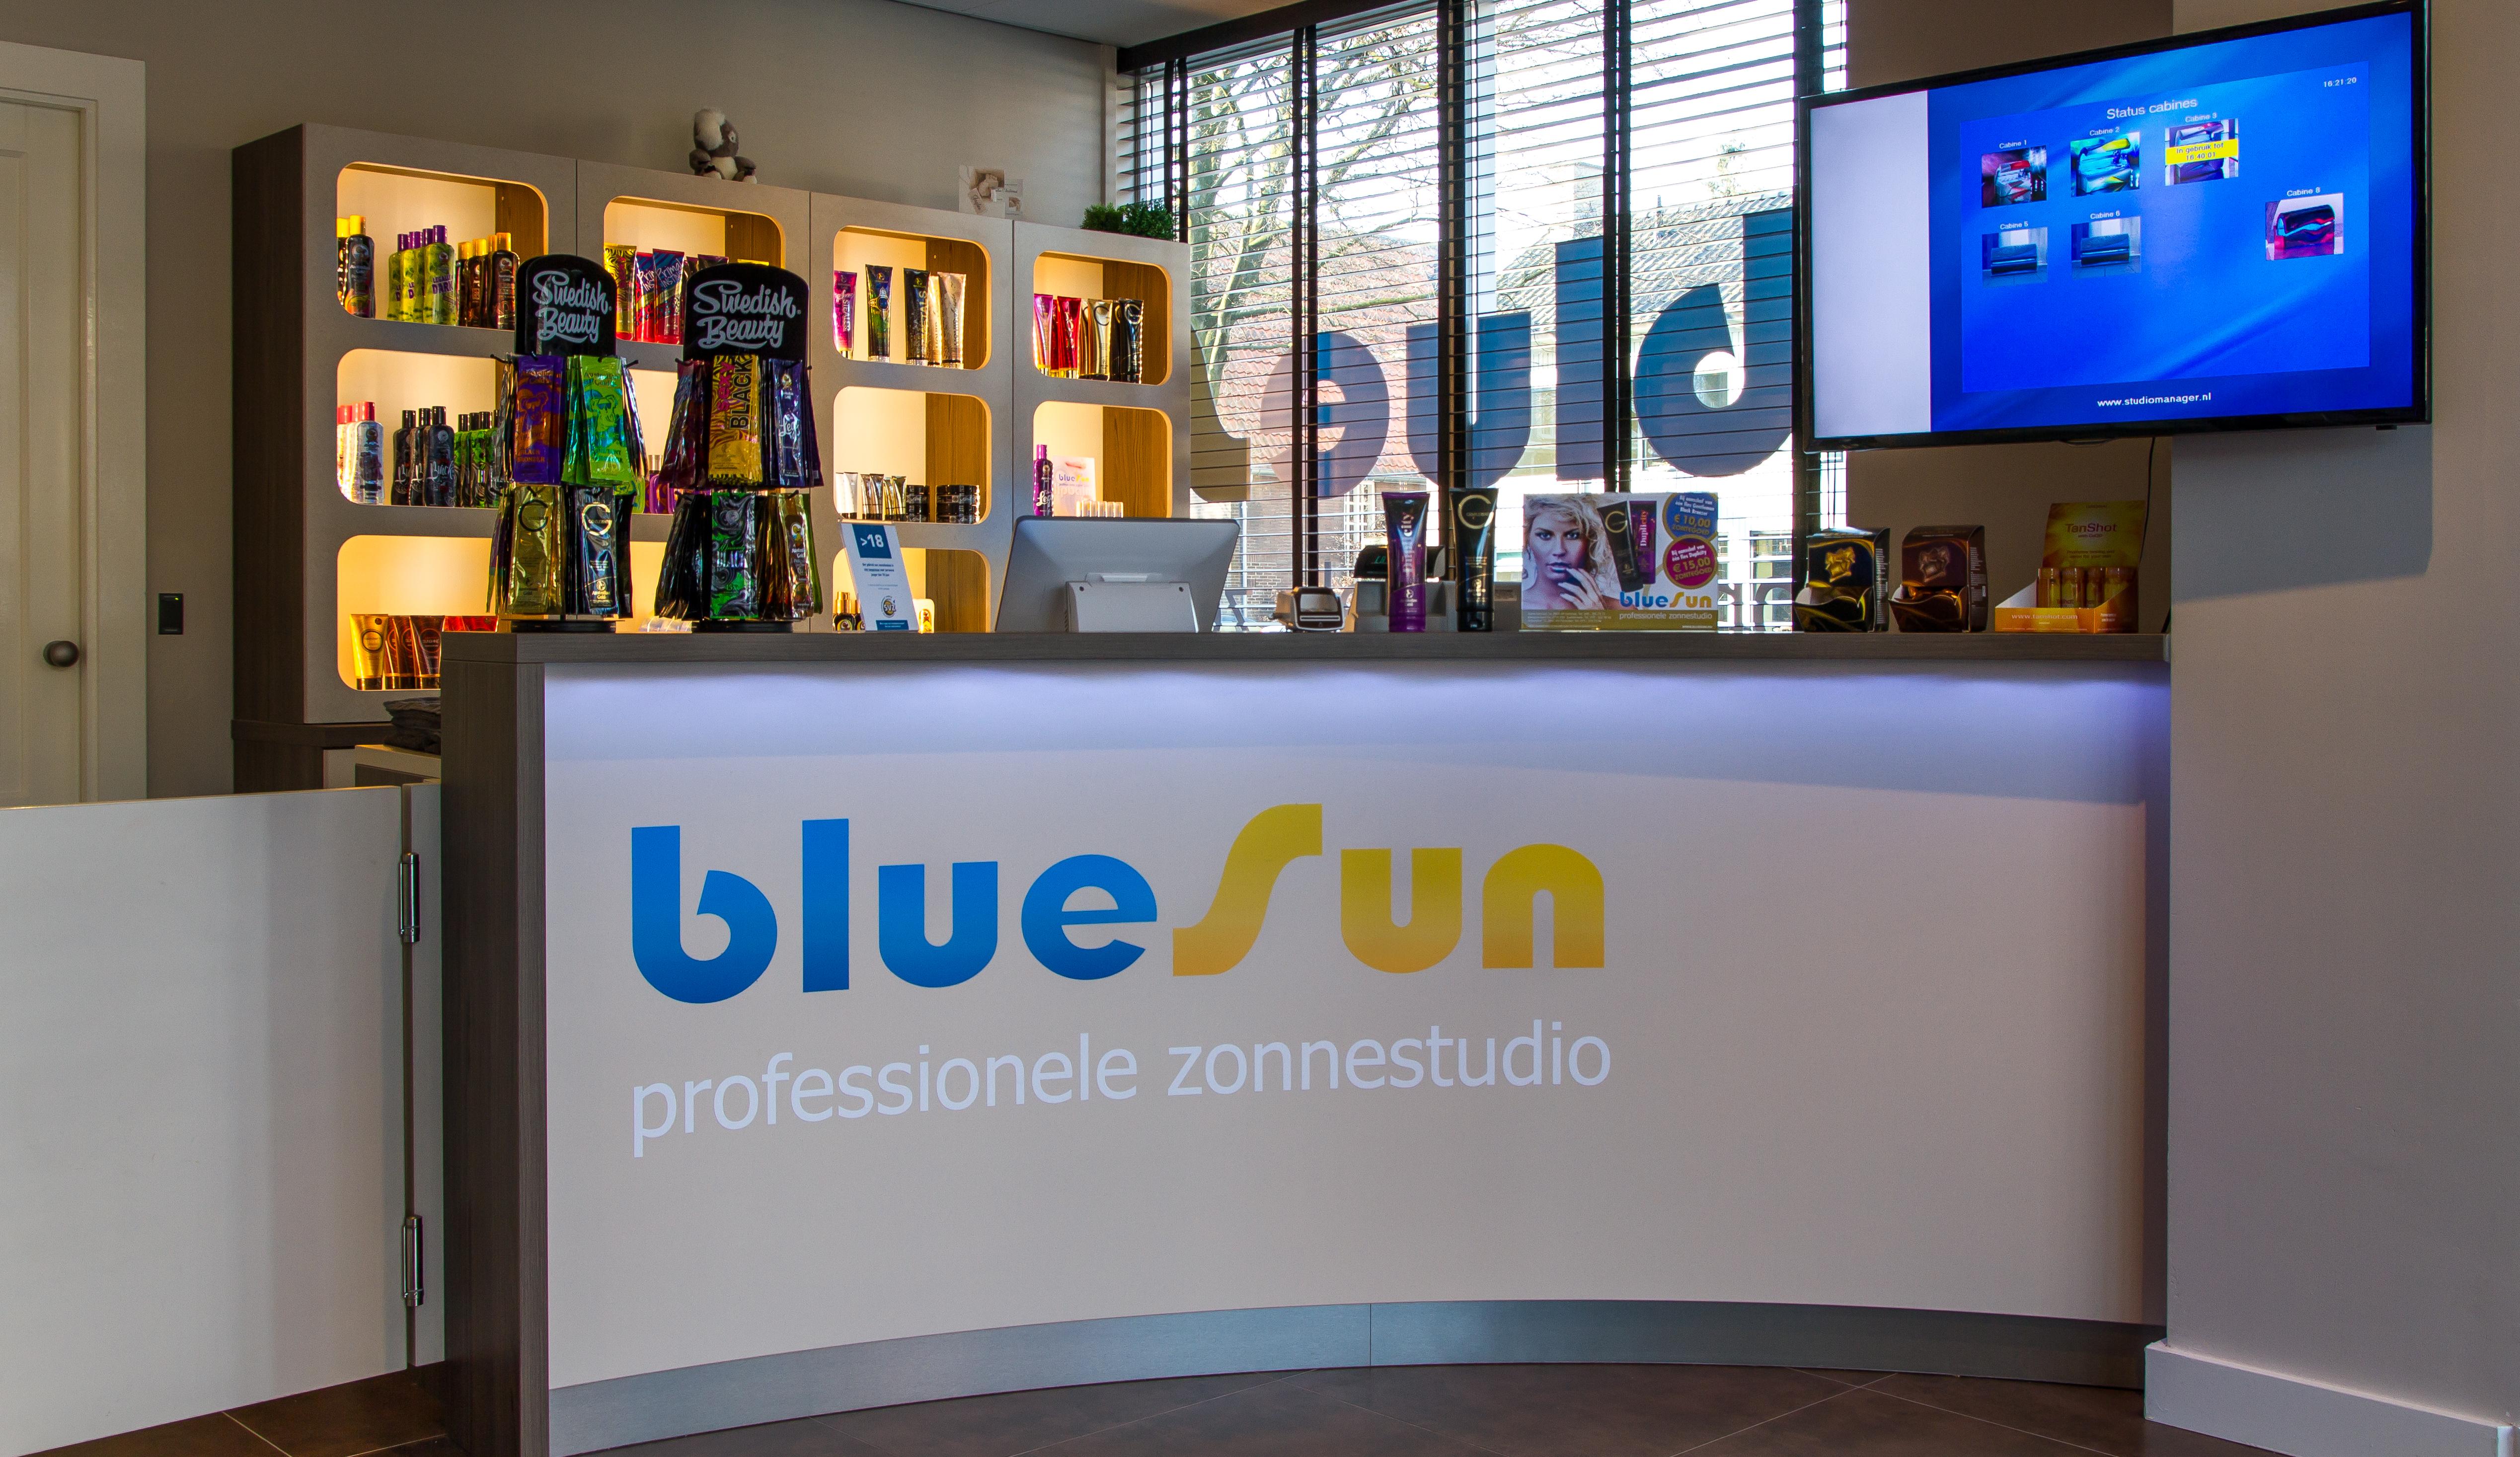 BlueSun Zonnestudio B.V.